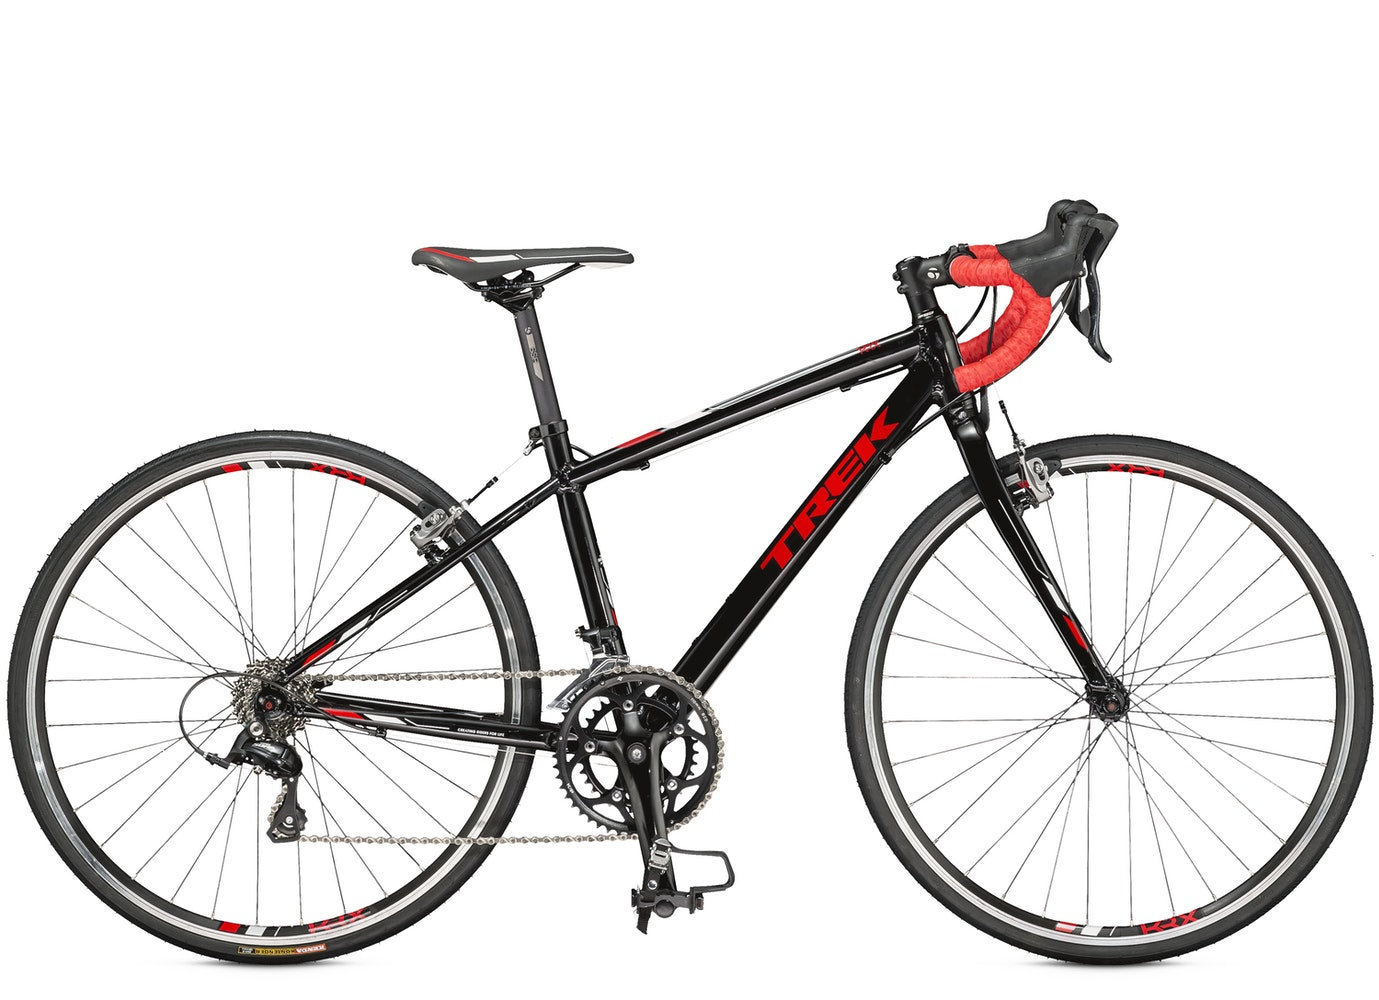 Kids trek bikes for sale / Lily direct promo code